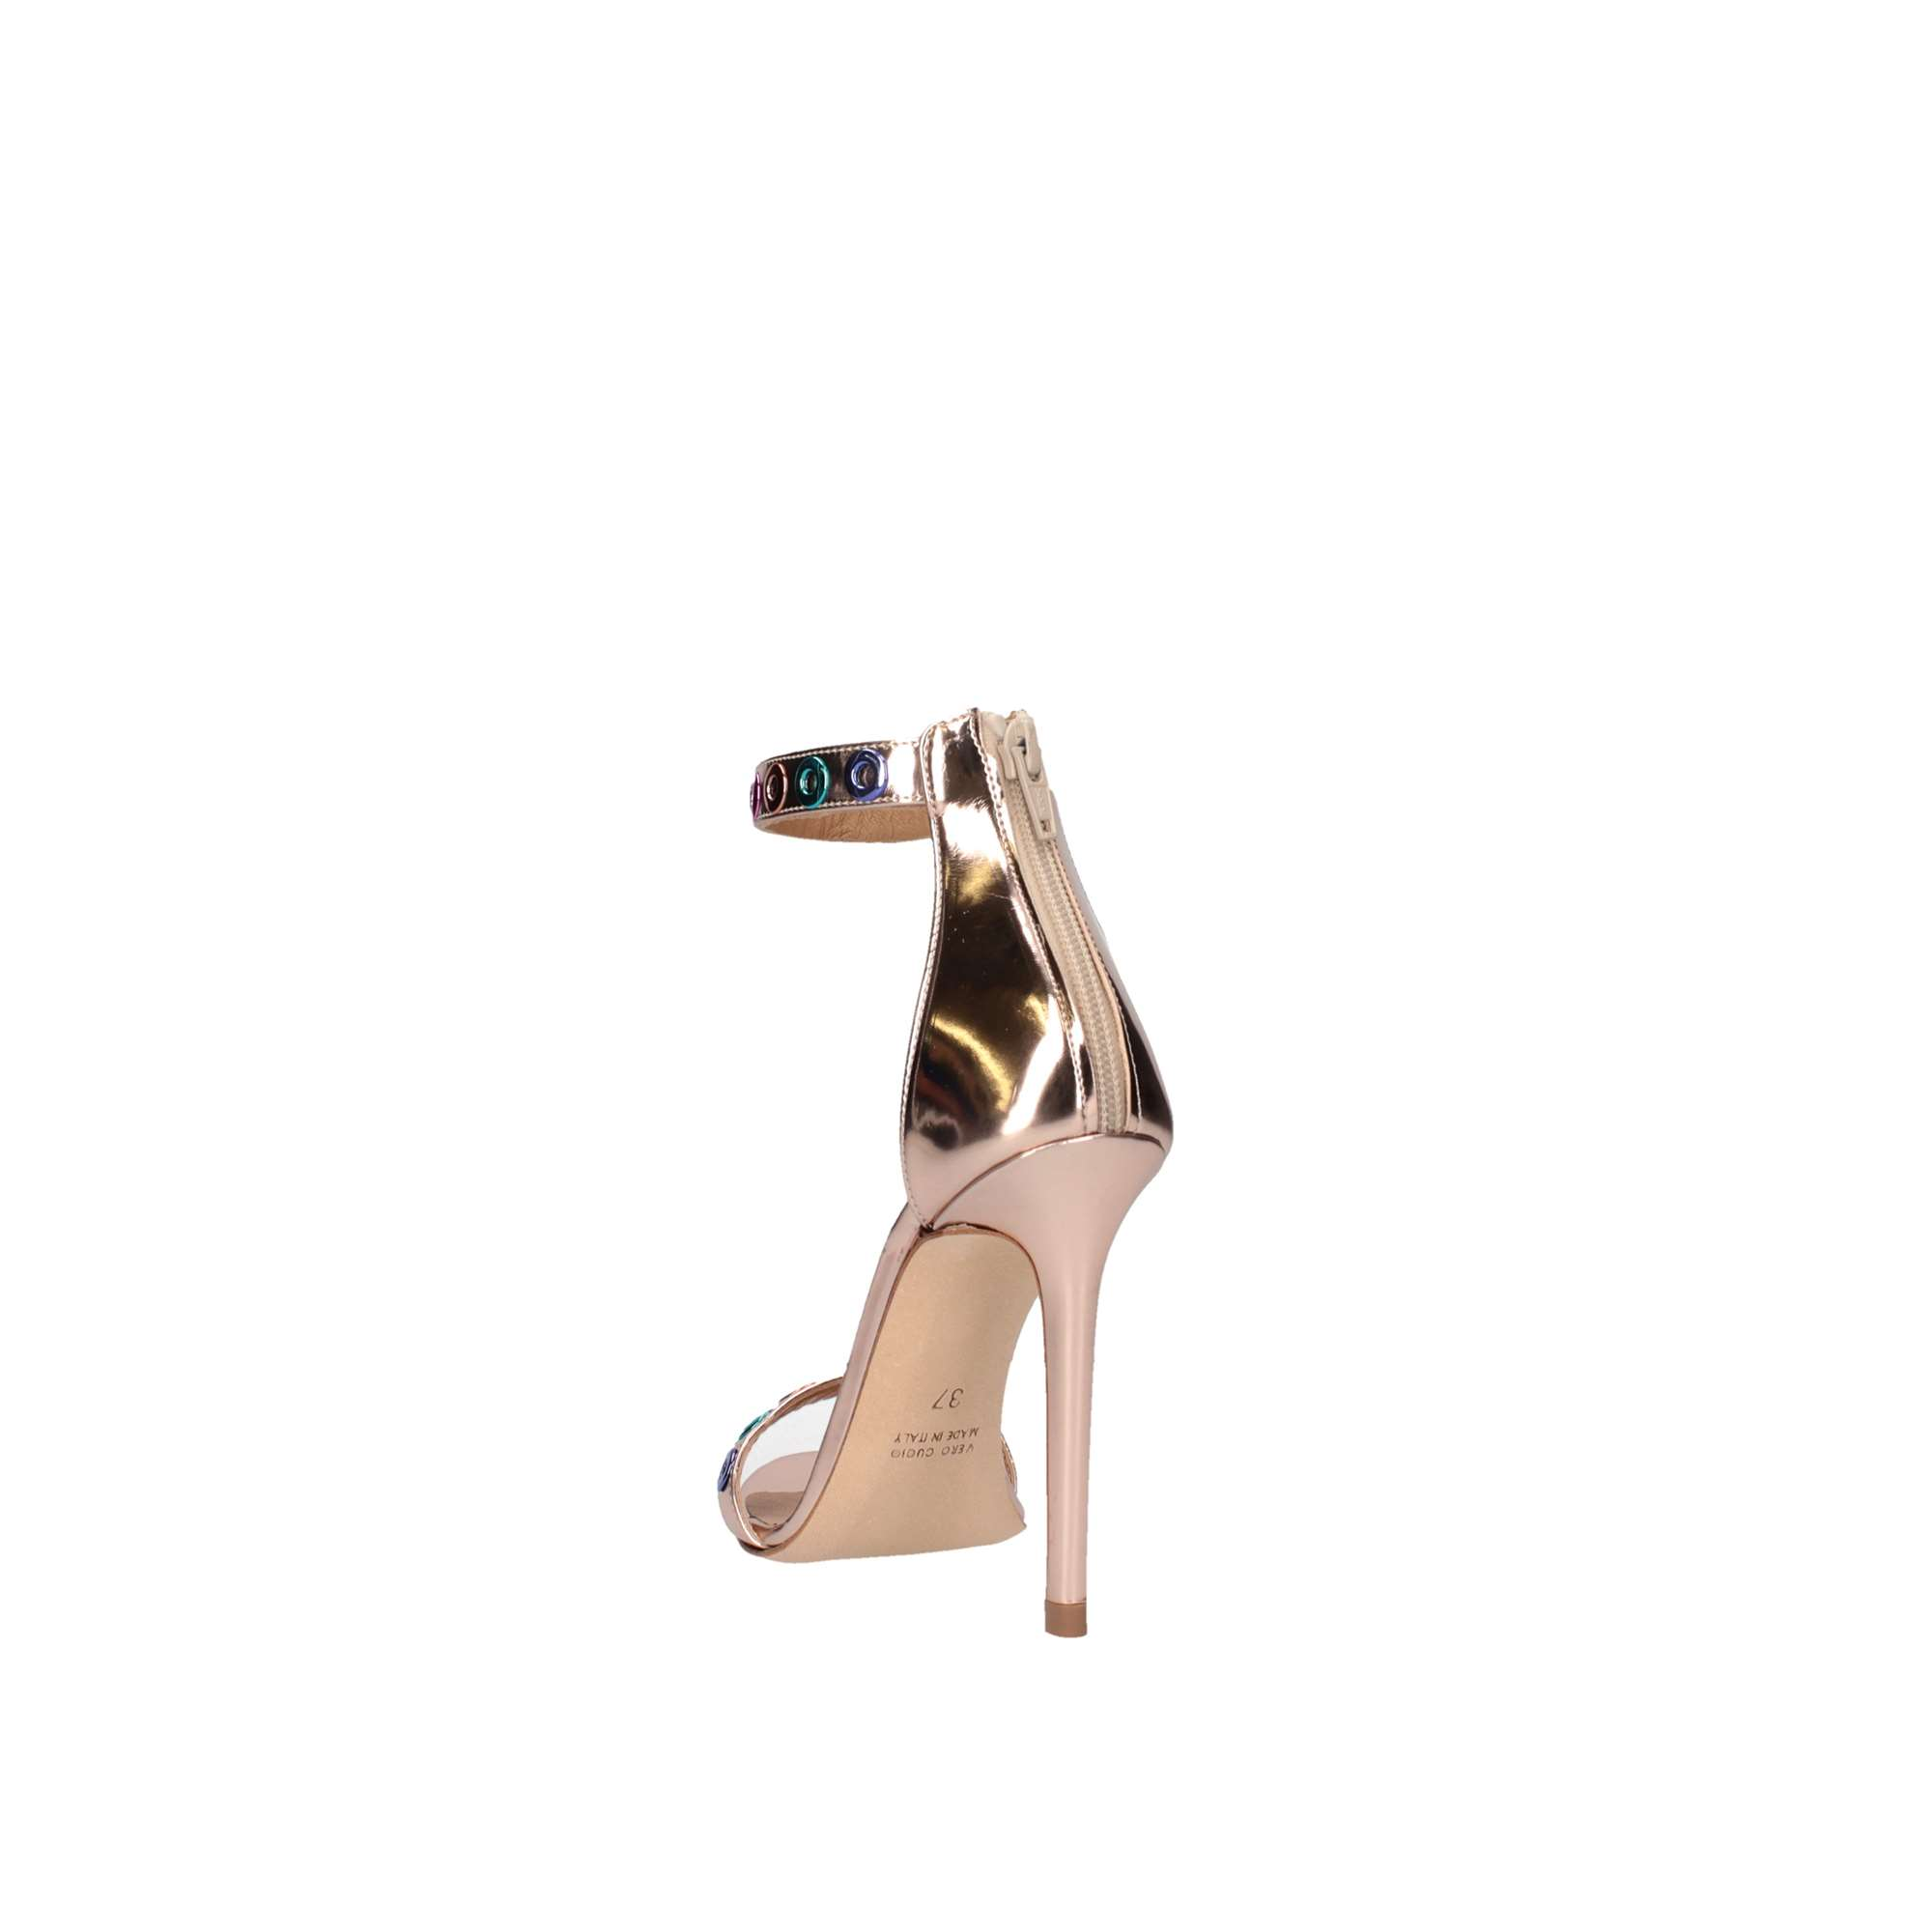 [TG.40] Hudson Fifa, Sandali Donna con Cinturino alla Caviglia Donna Sandali 9715fc